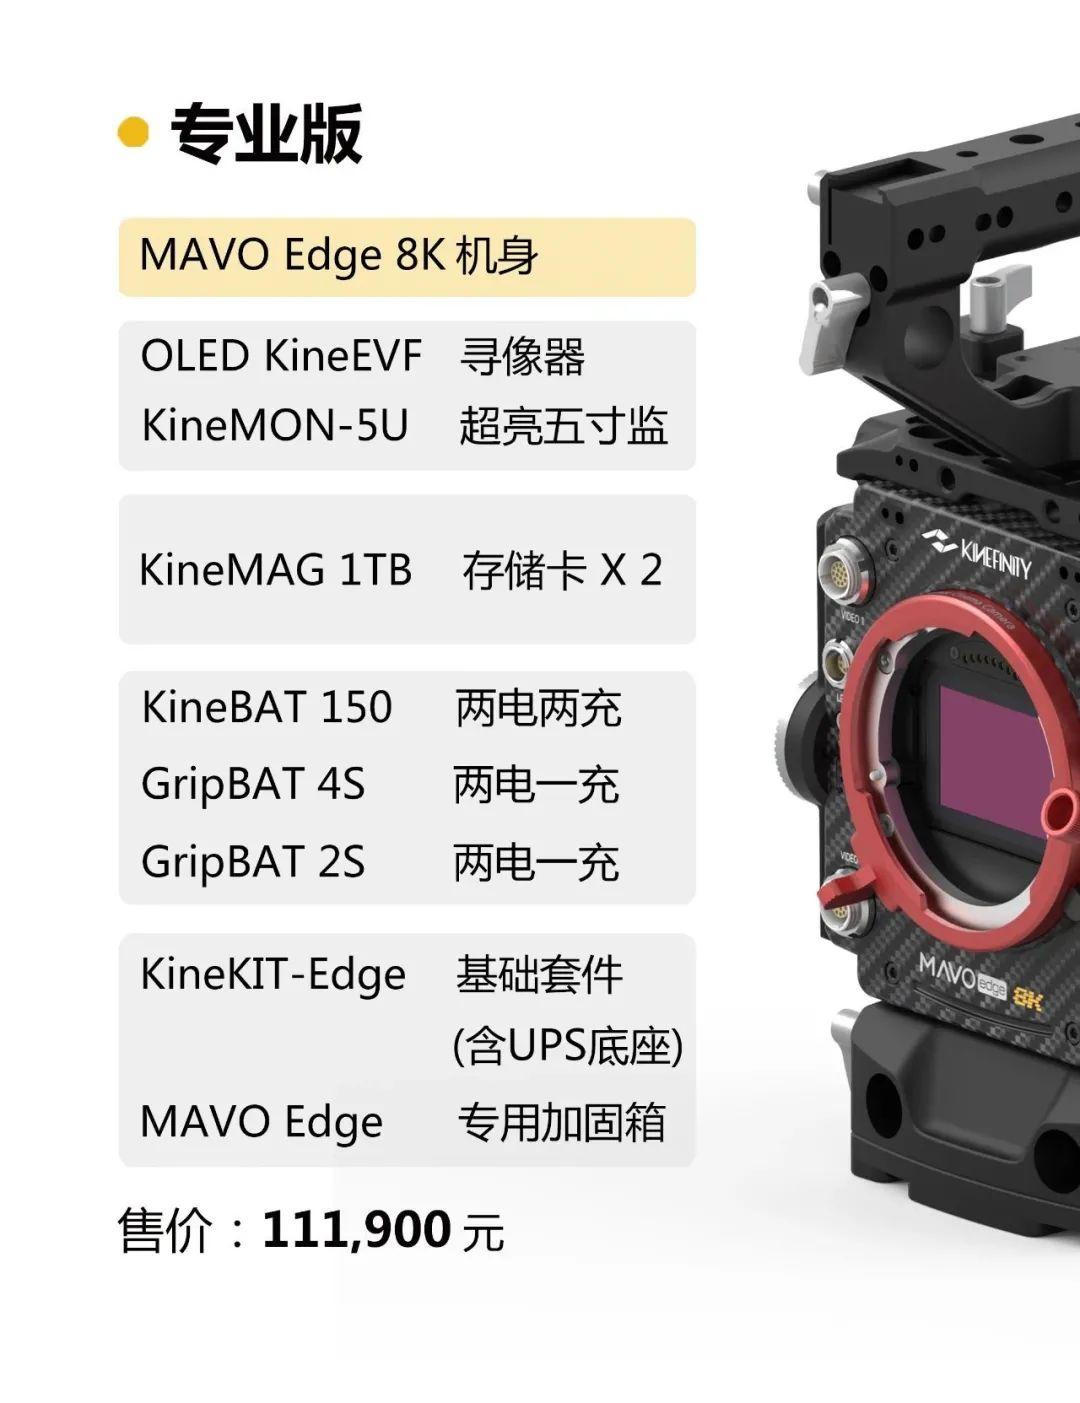 MAVO Edge 8K 正式发售! 8K摄影机 第12张